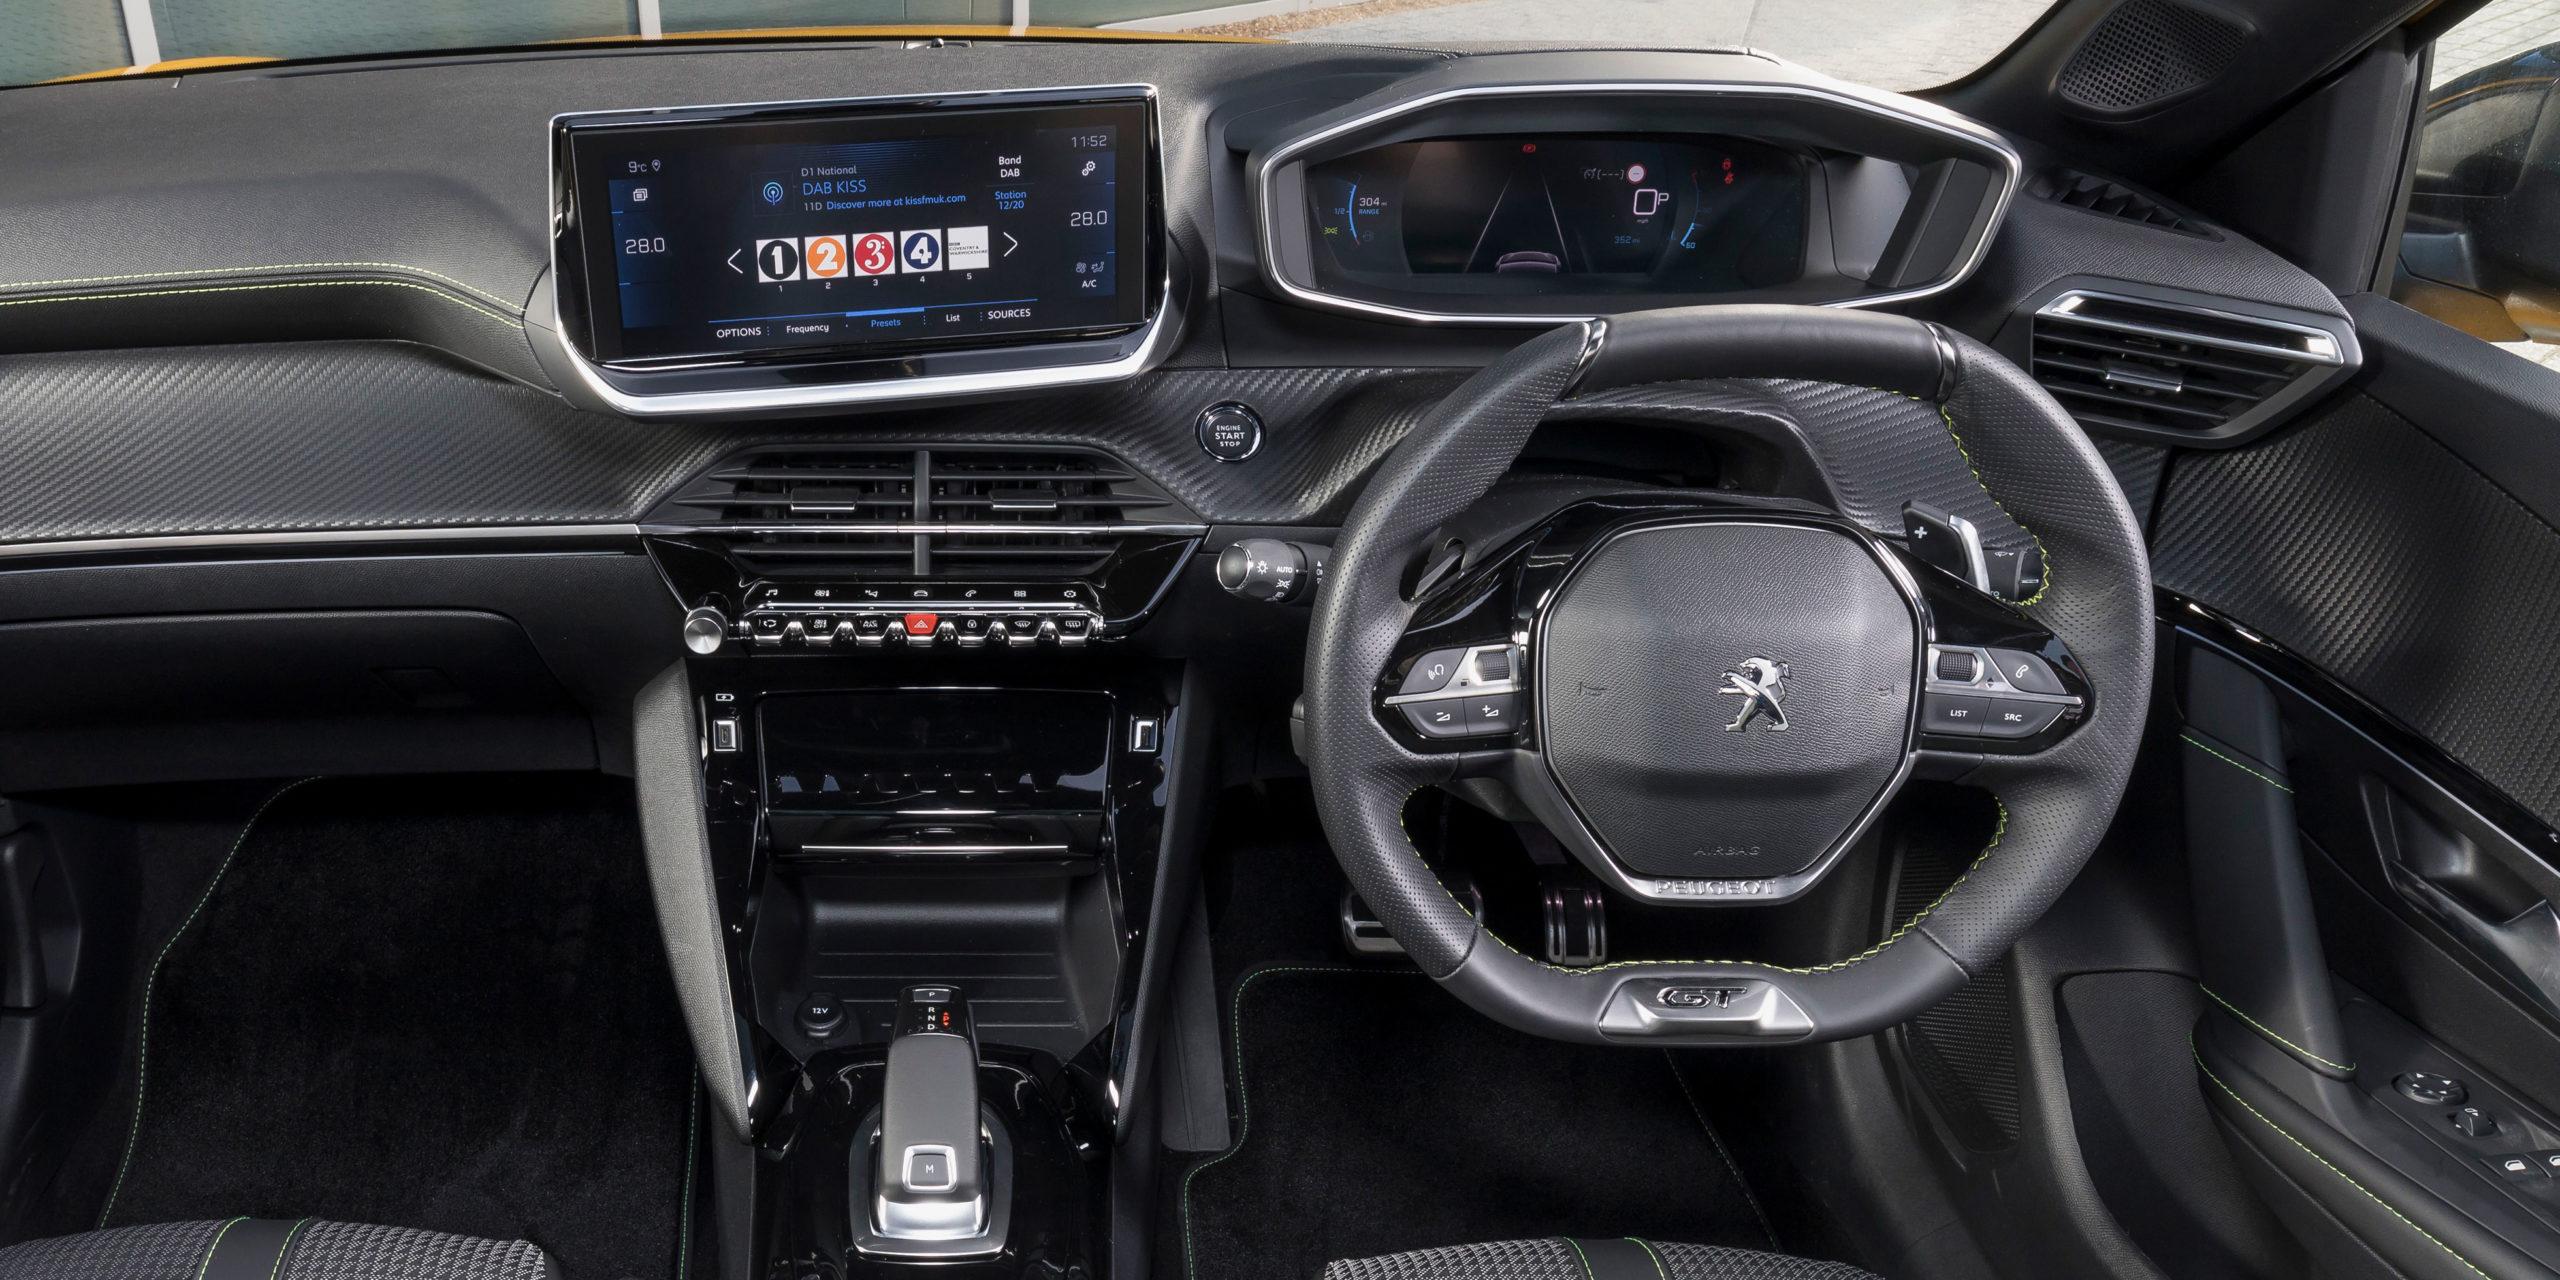 Peugeot 208 Interior Infotainment Carwow